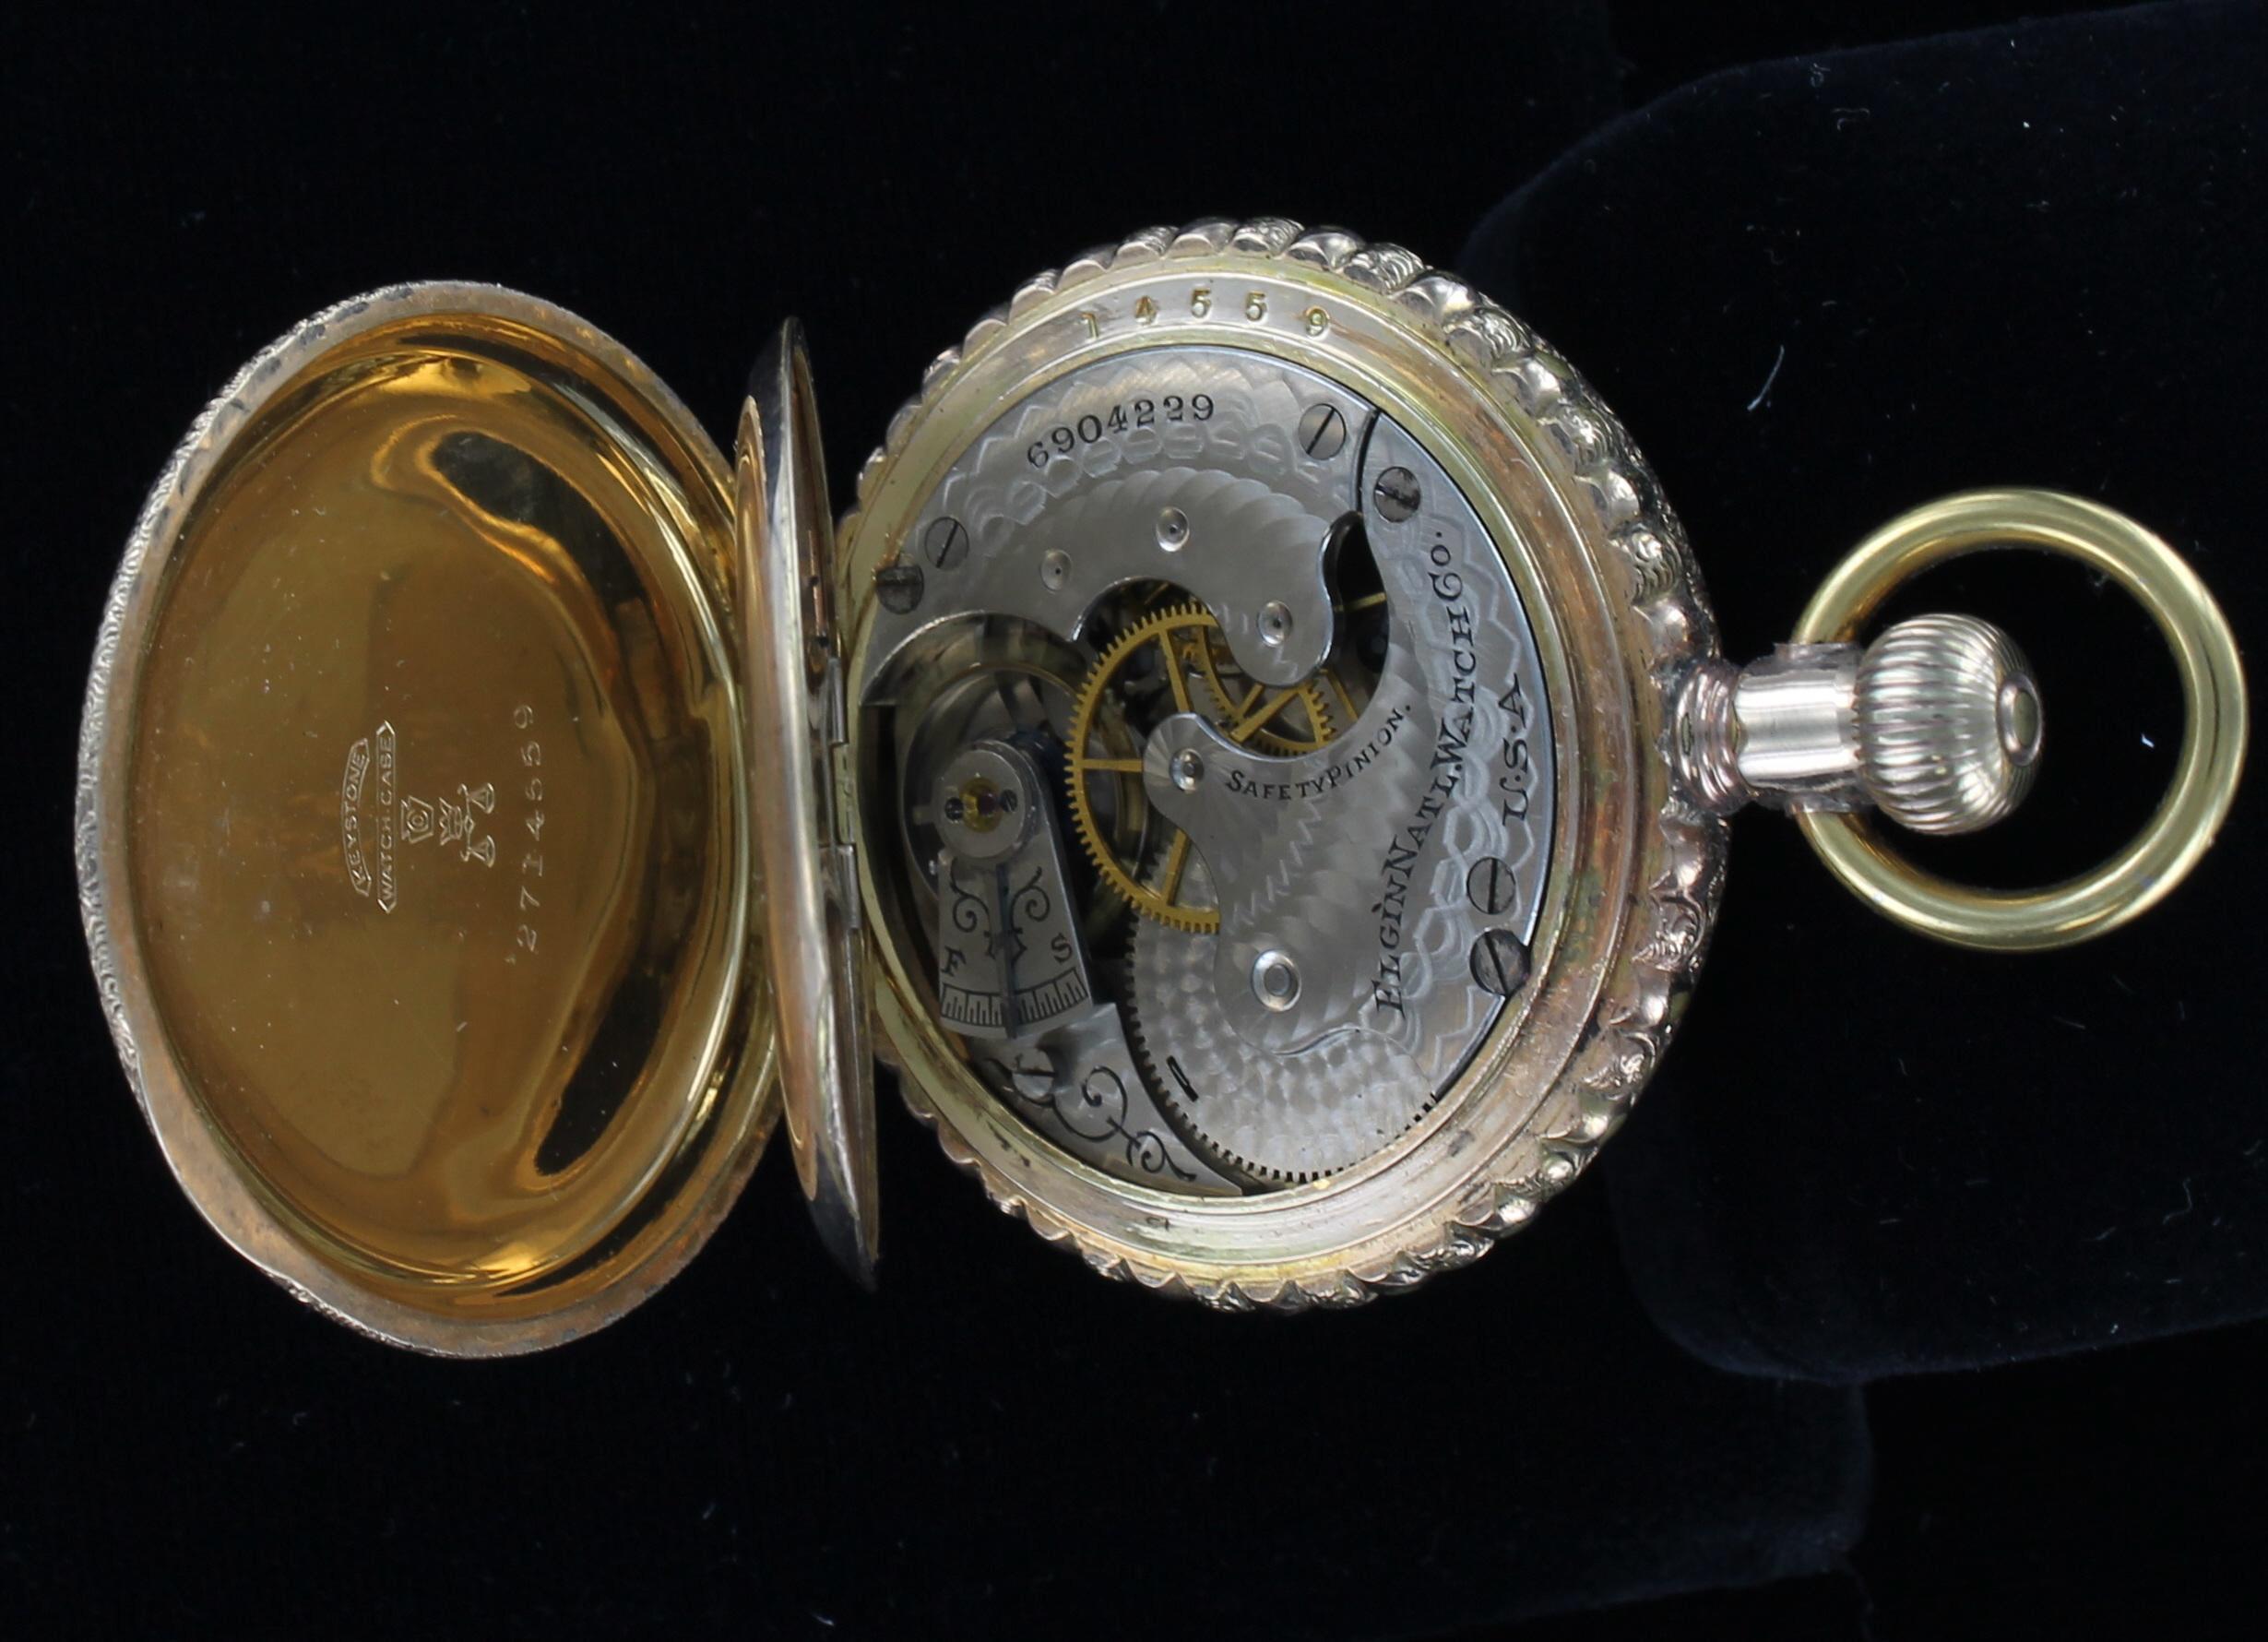 GOLD-FILLED POCKET WATCH CIRCA 1930